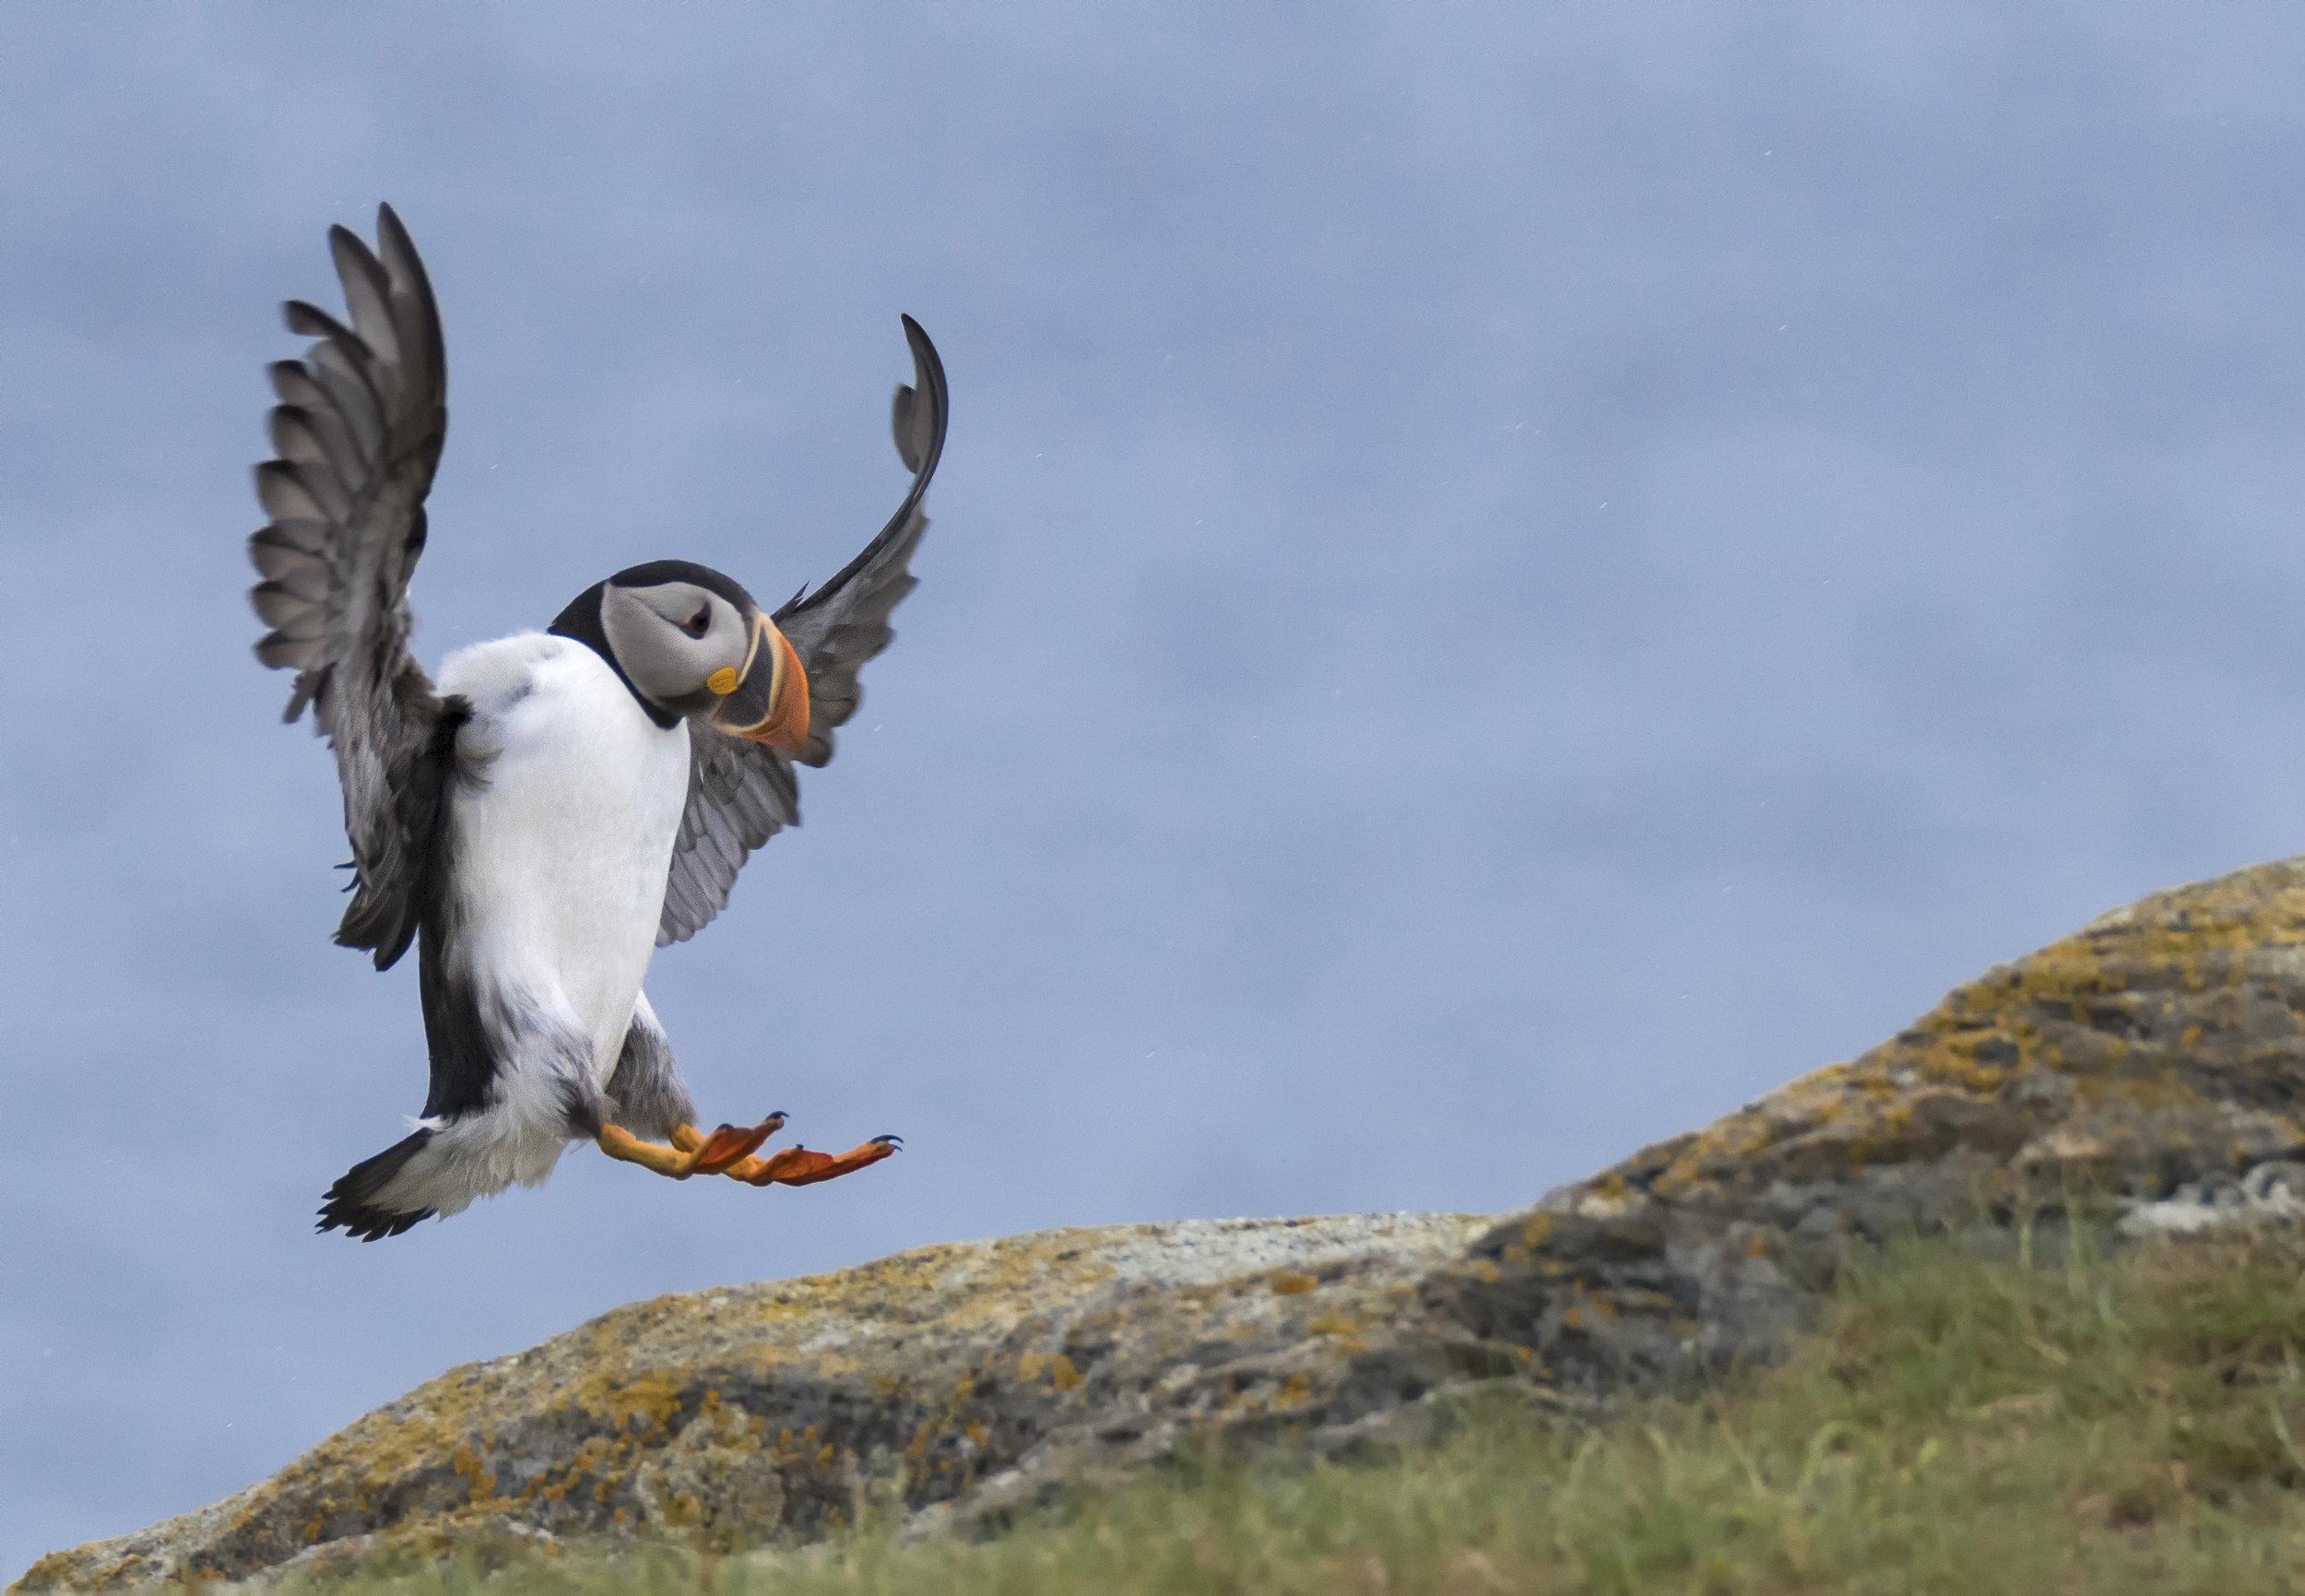 elliston puffin coming in for landing.jpg